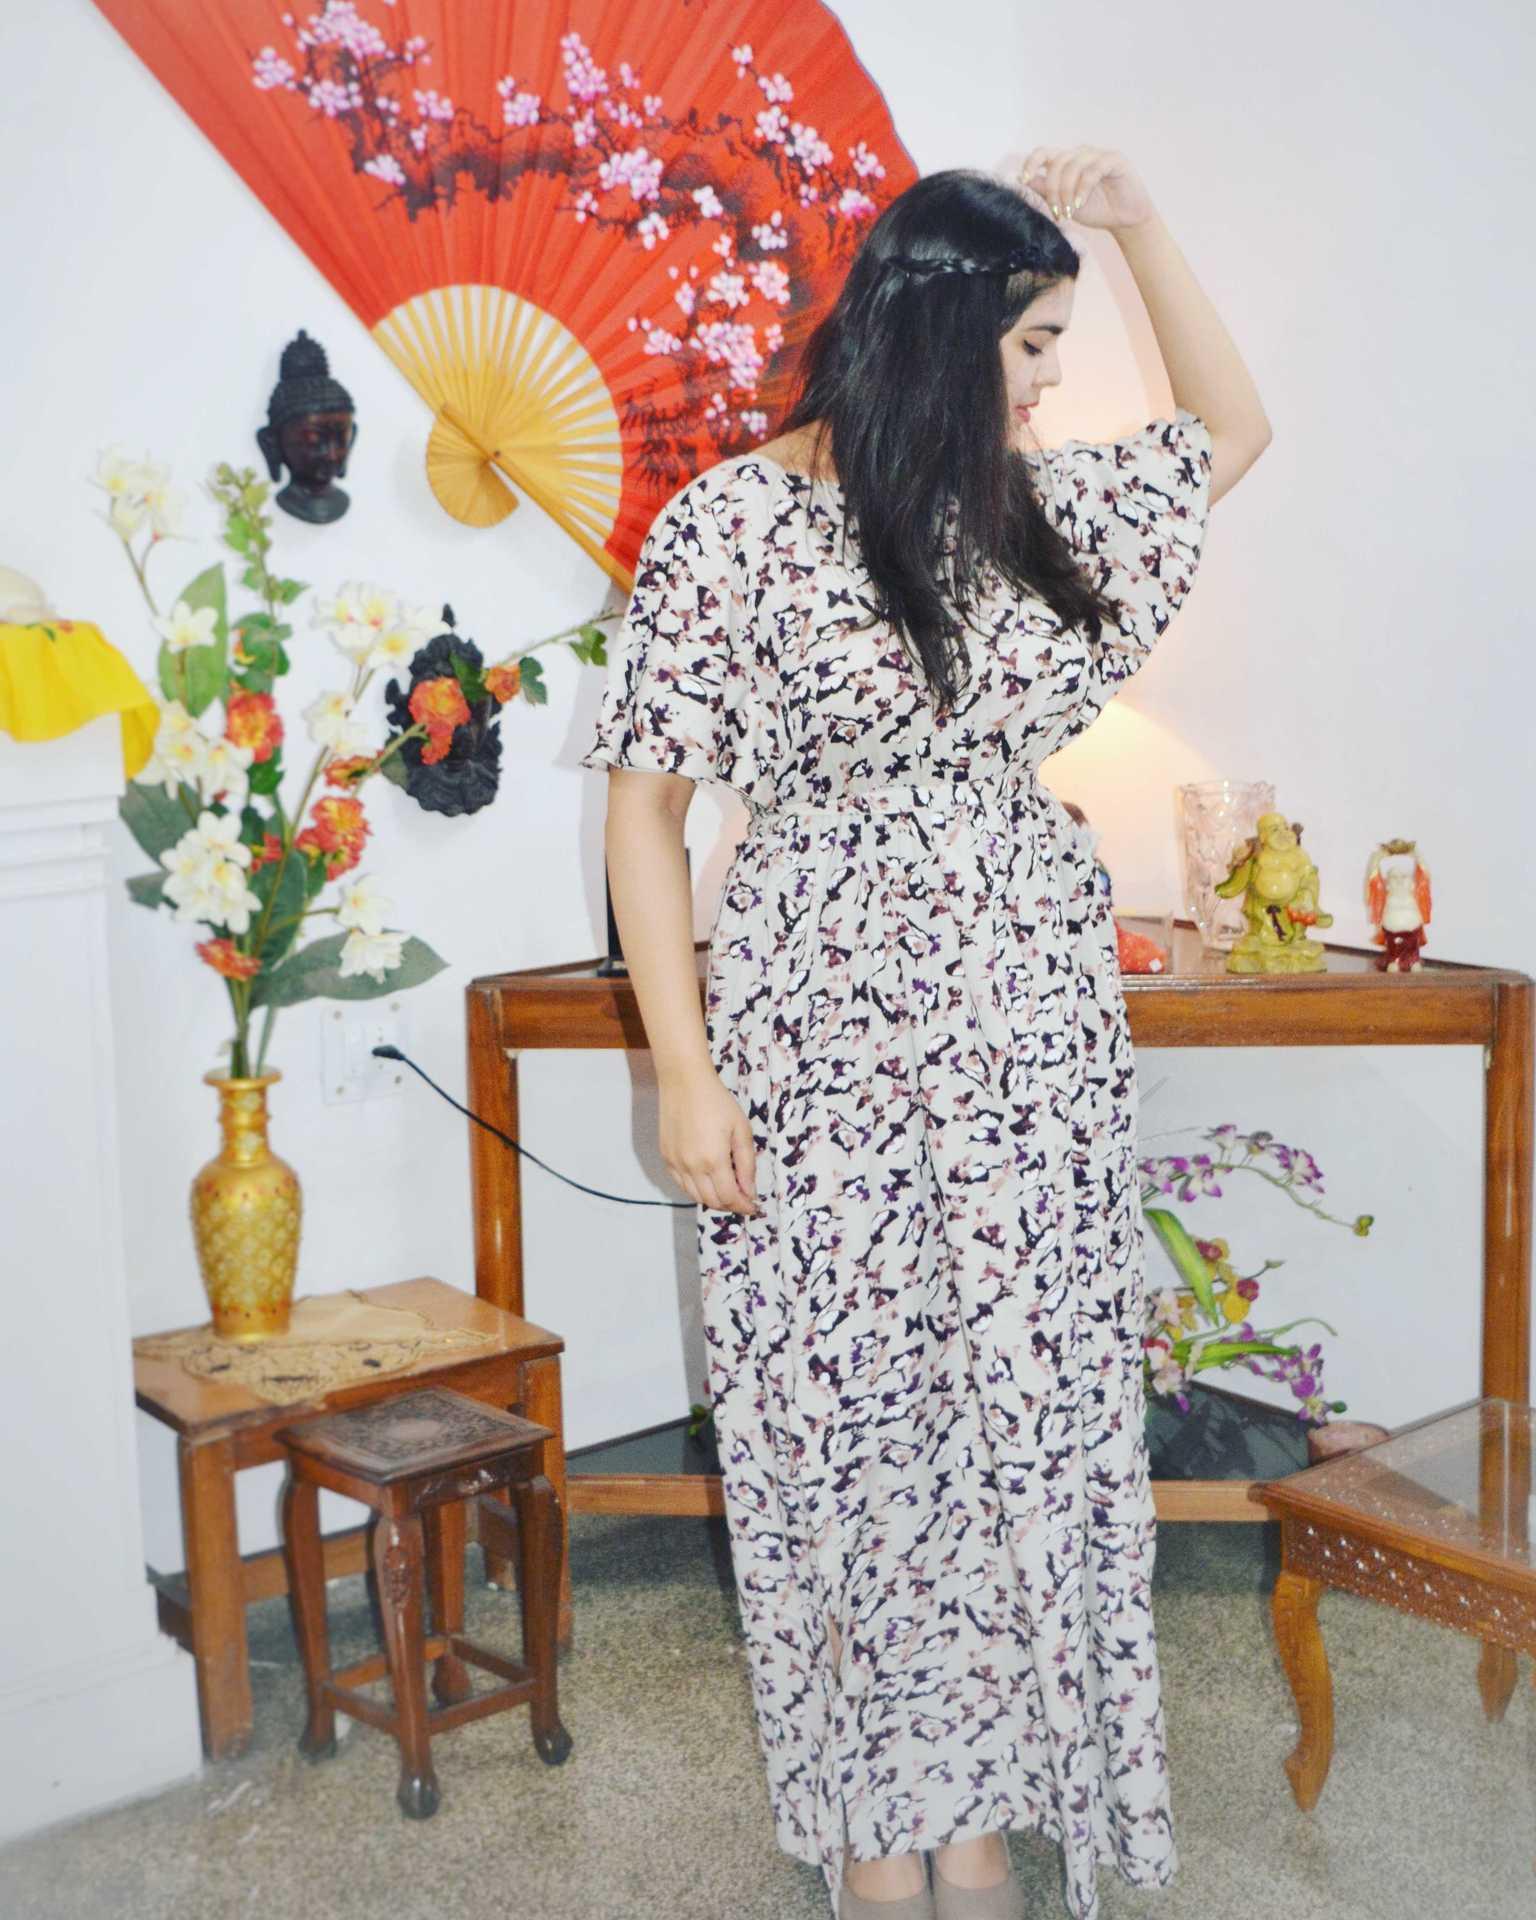 The Gypsy Girl Things - IMG_20180116_170953_392